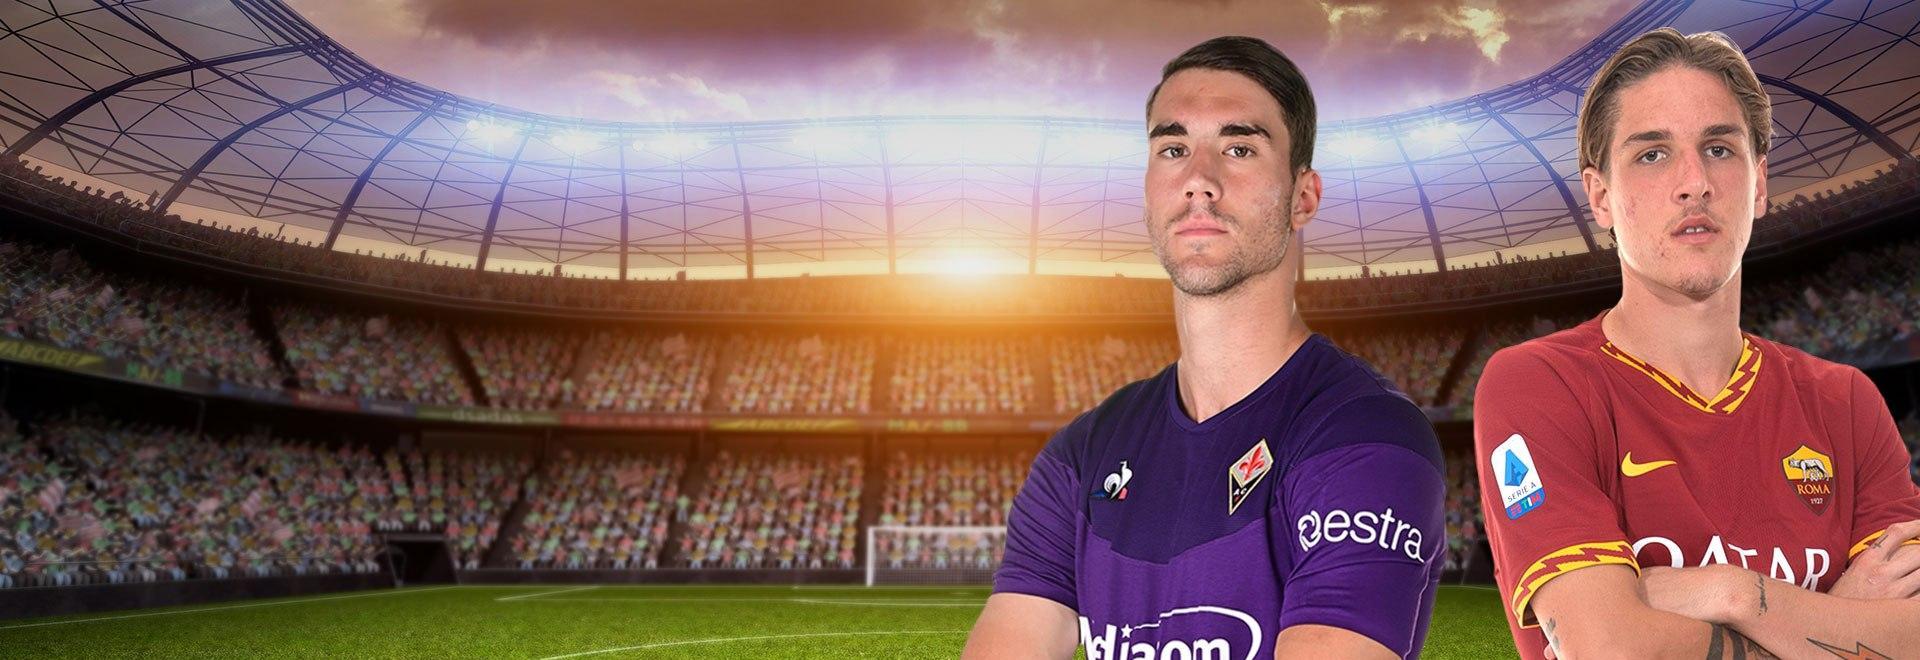 Fiorentina - Roma. 17a g.